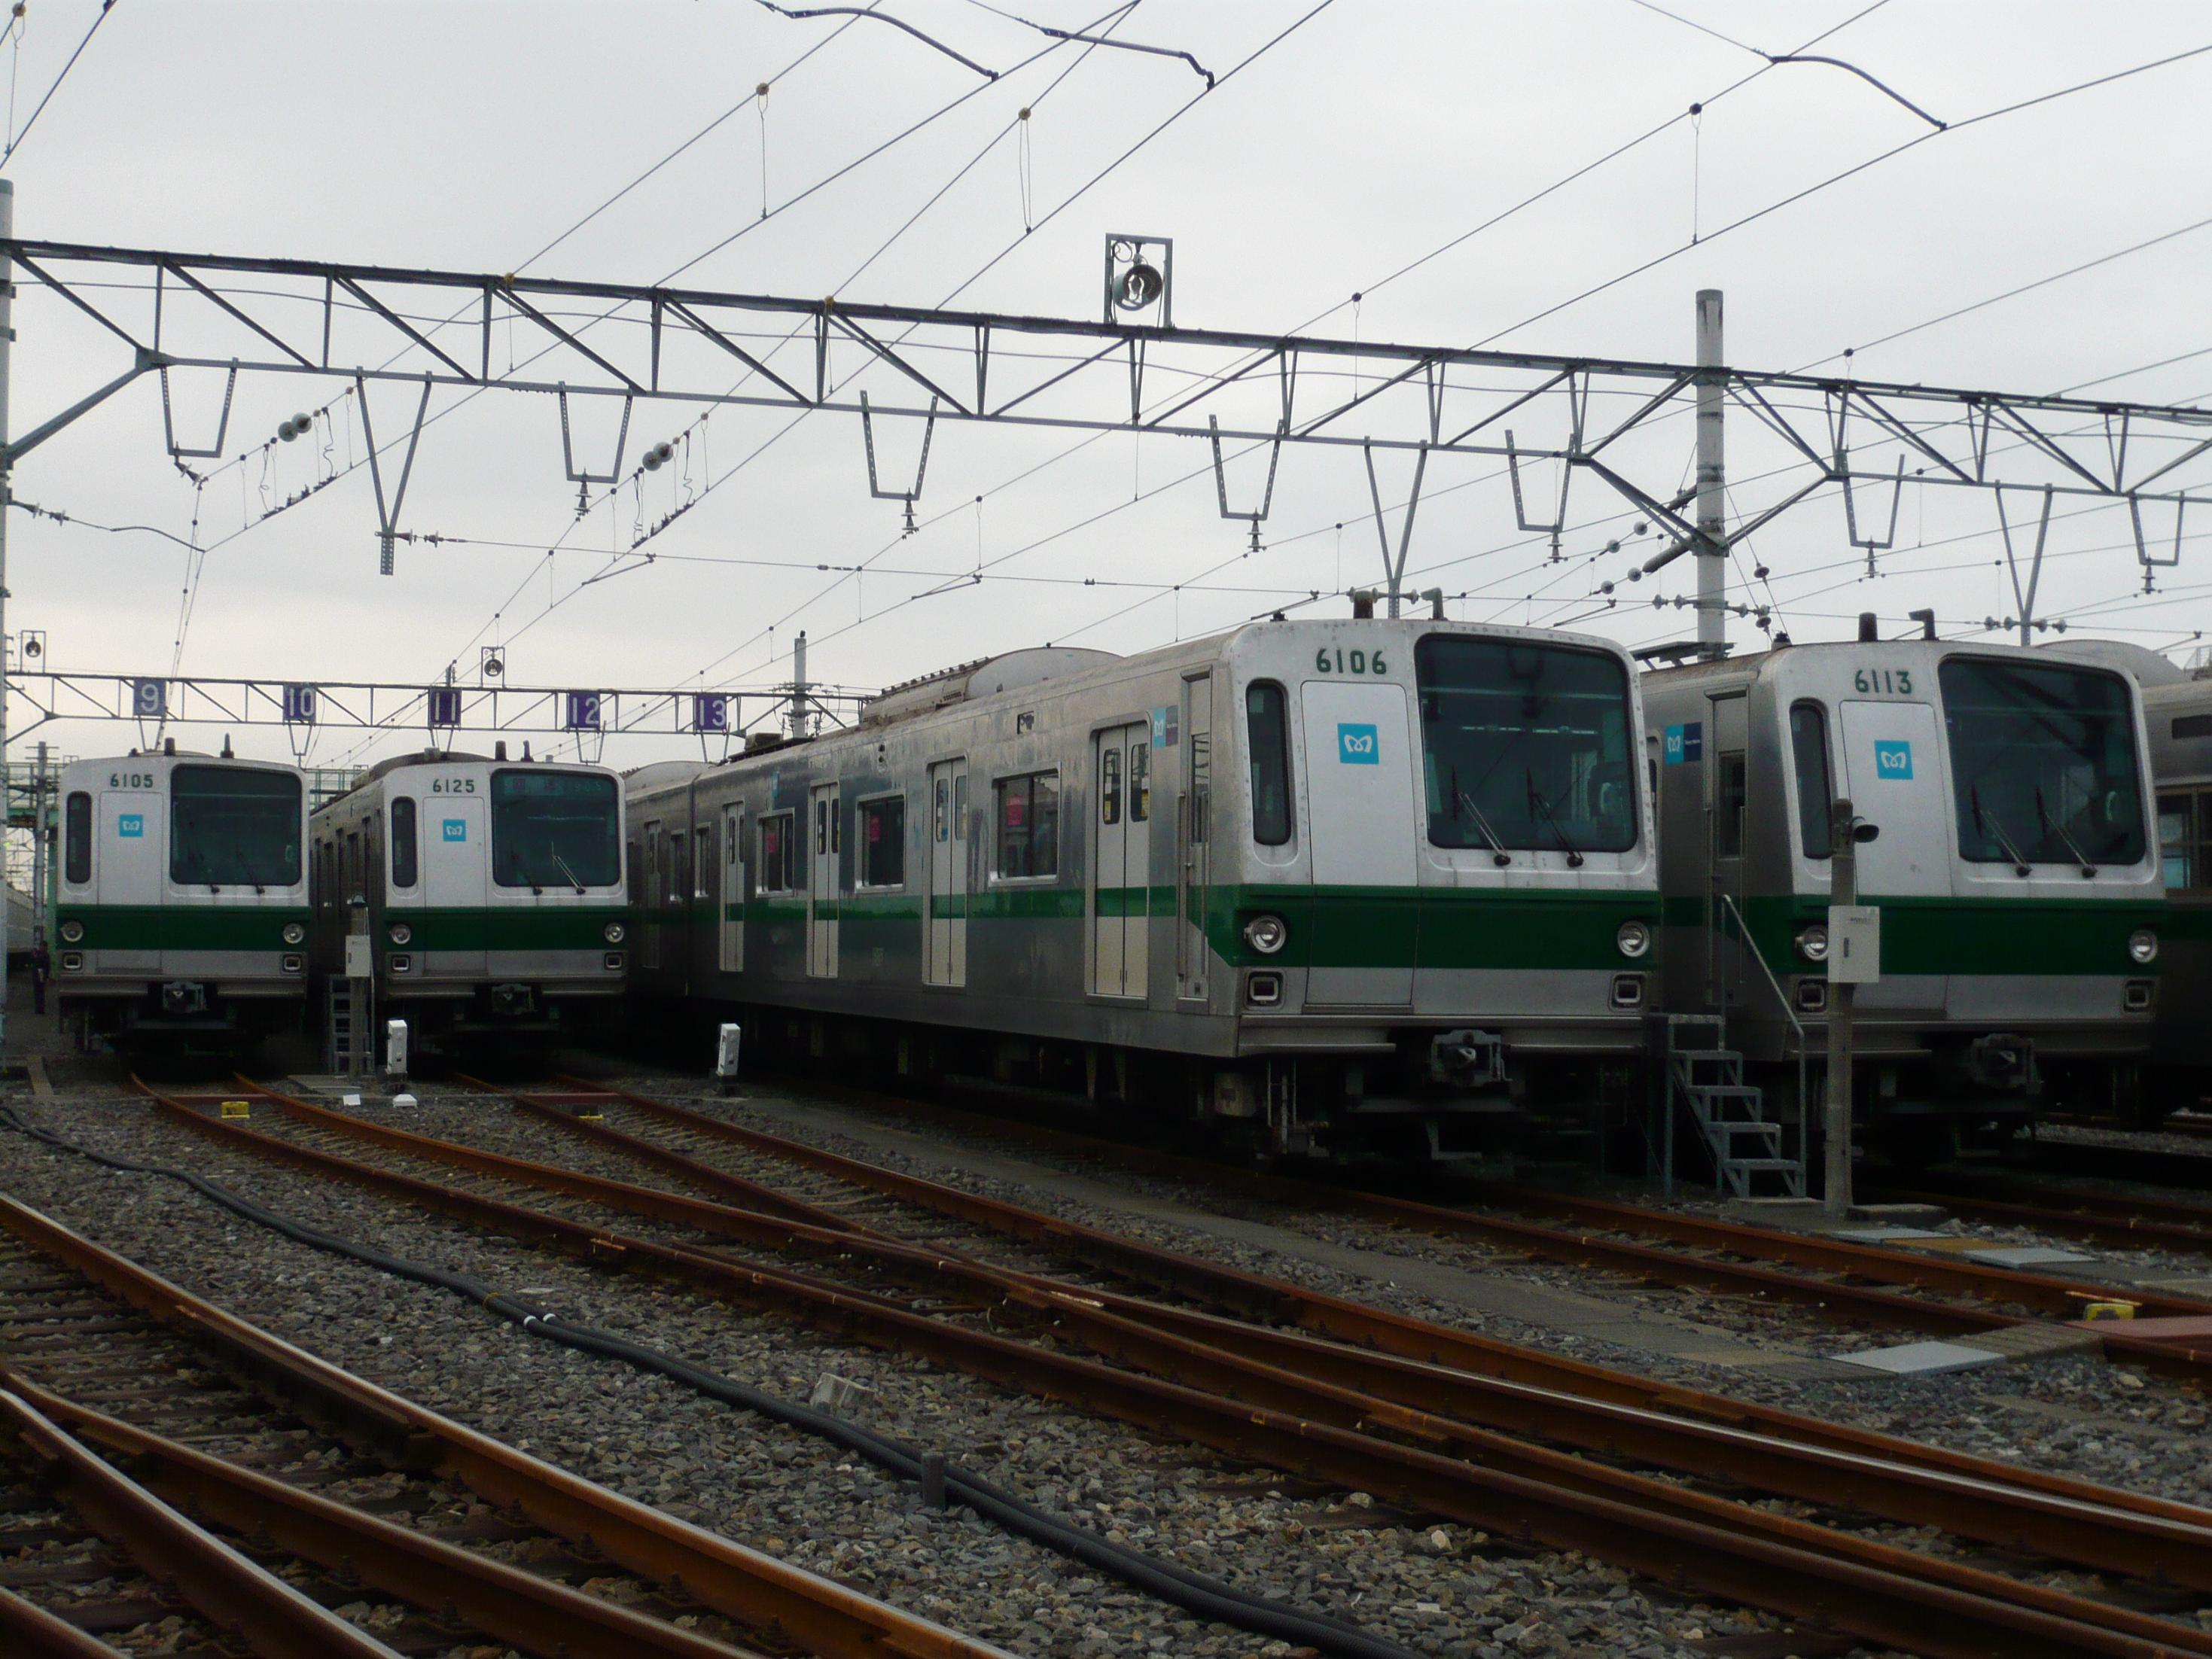 P1010788-2.JPG